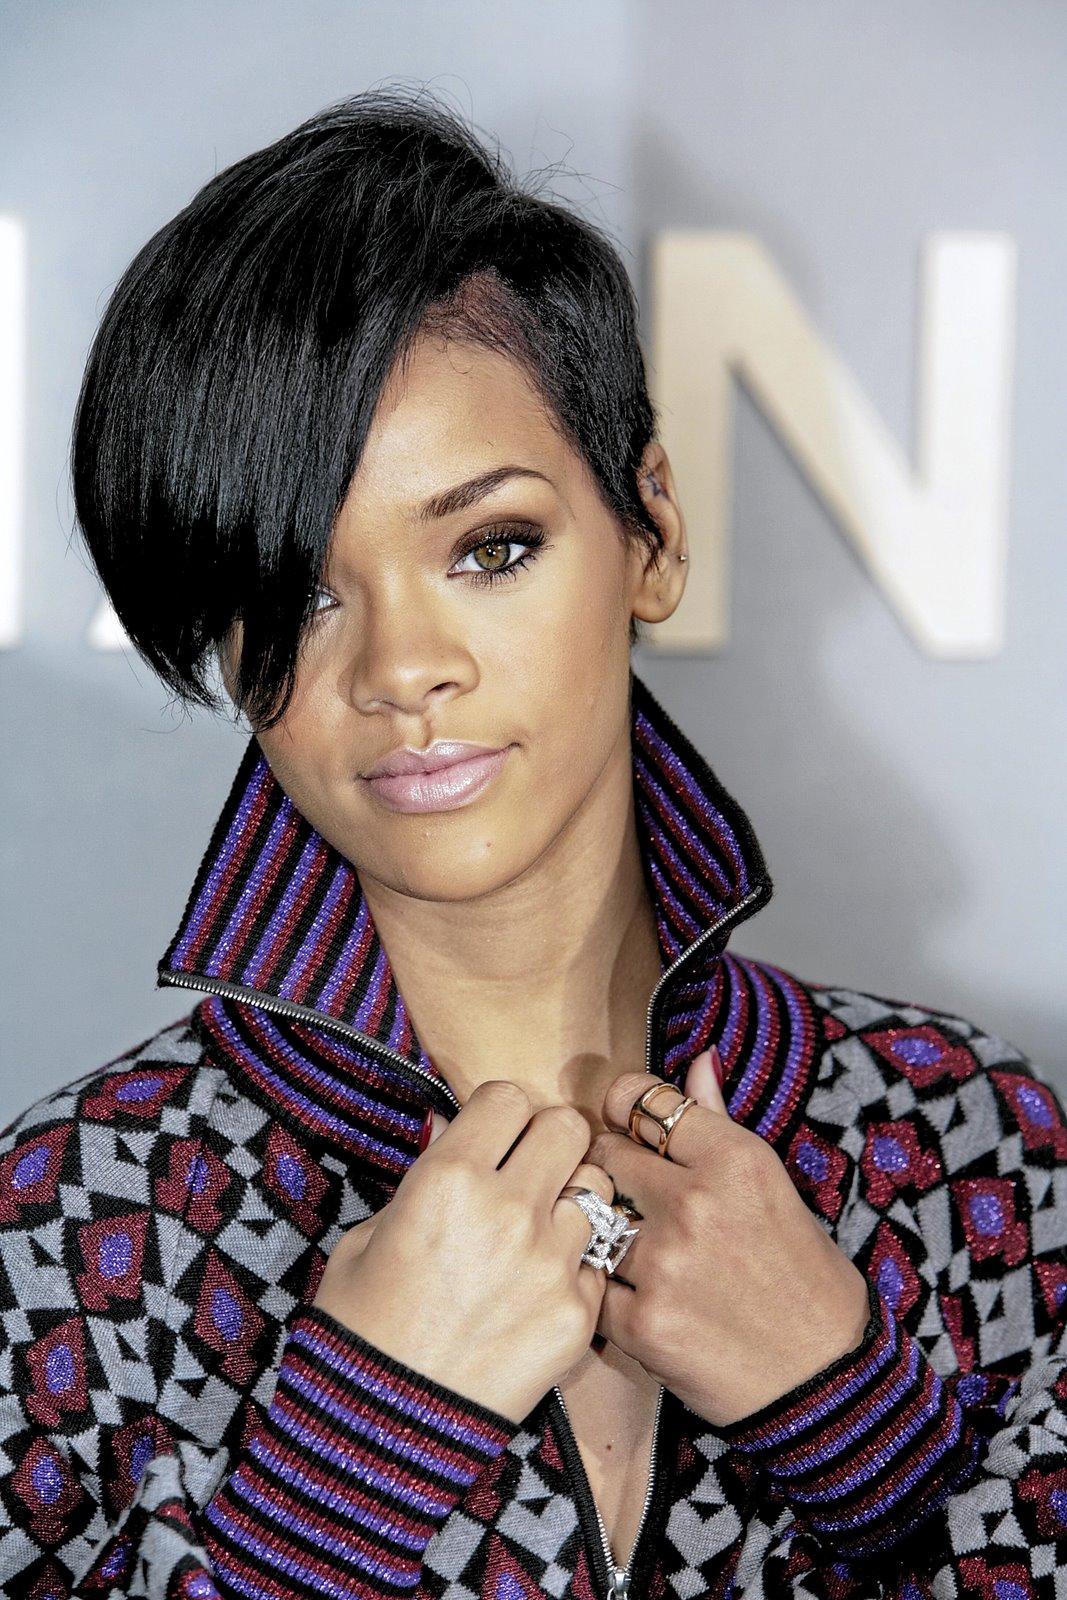 Phenomenal Short Cut Hairstyles Black Women Short Hairstyles For Women And Man Short Hairstyles For Black Women Fulllsitofus